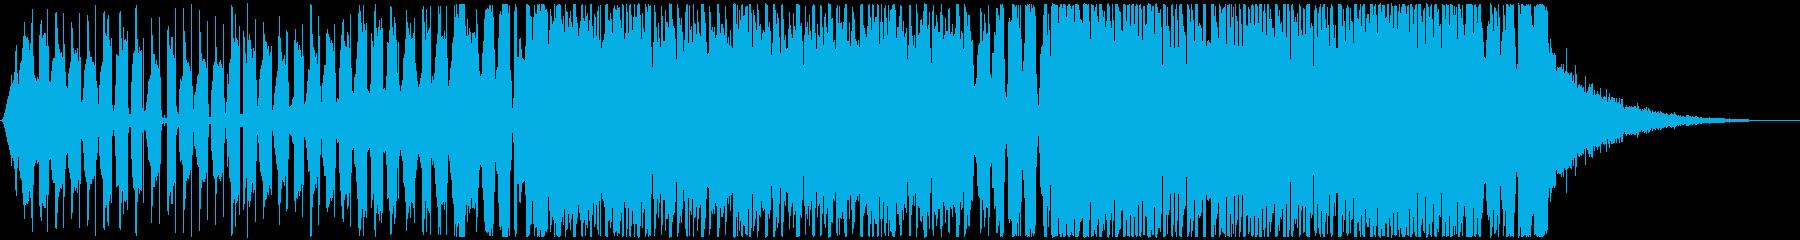 e-sports大会のOPっぽいEDM曲の再生済みの波形